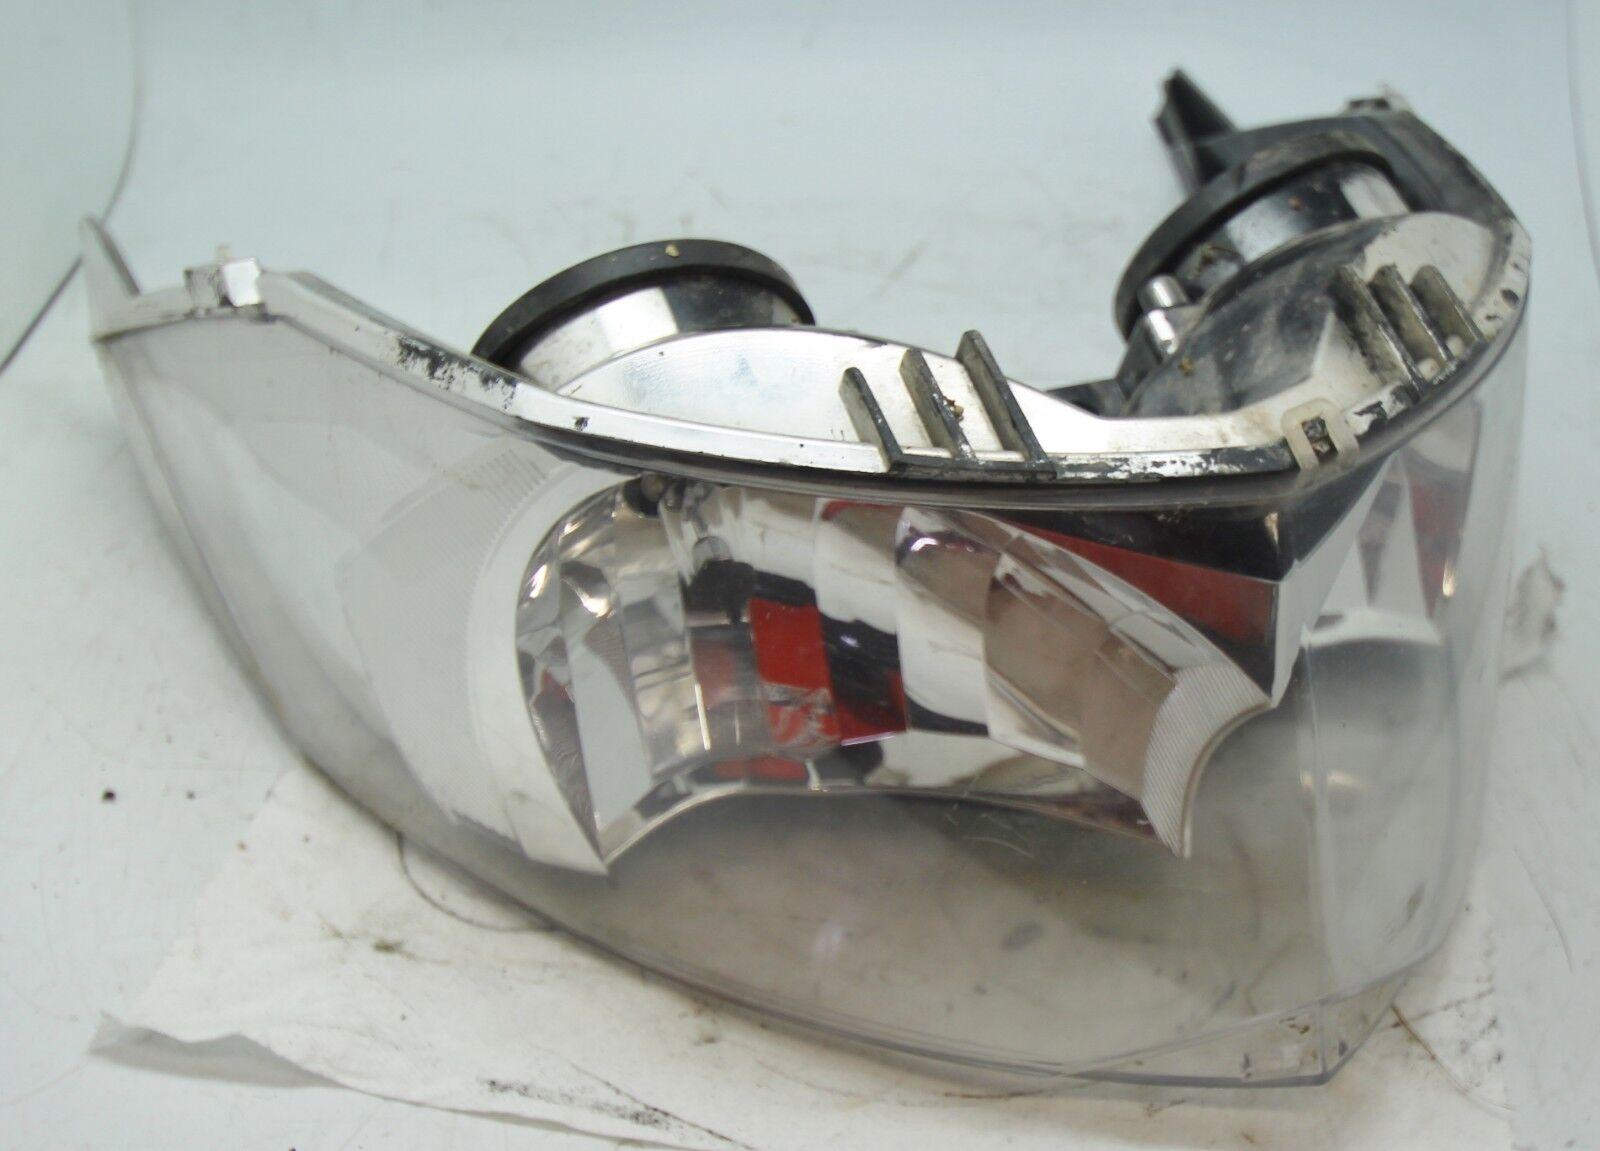 2012 Arctic Cat 800 Headlight Head Light FREE SHIPPING